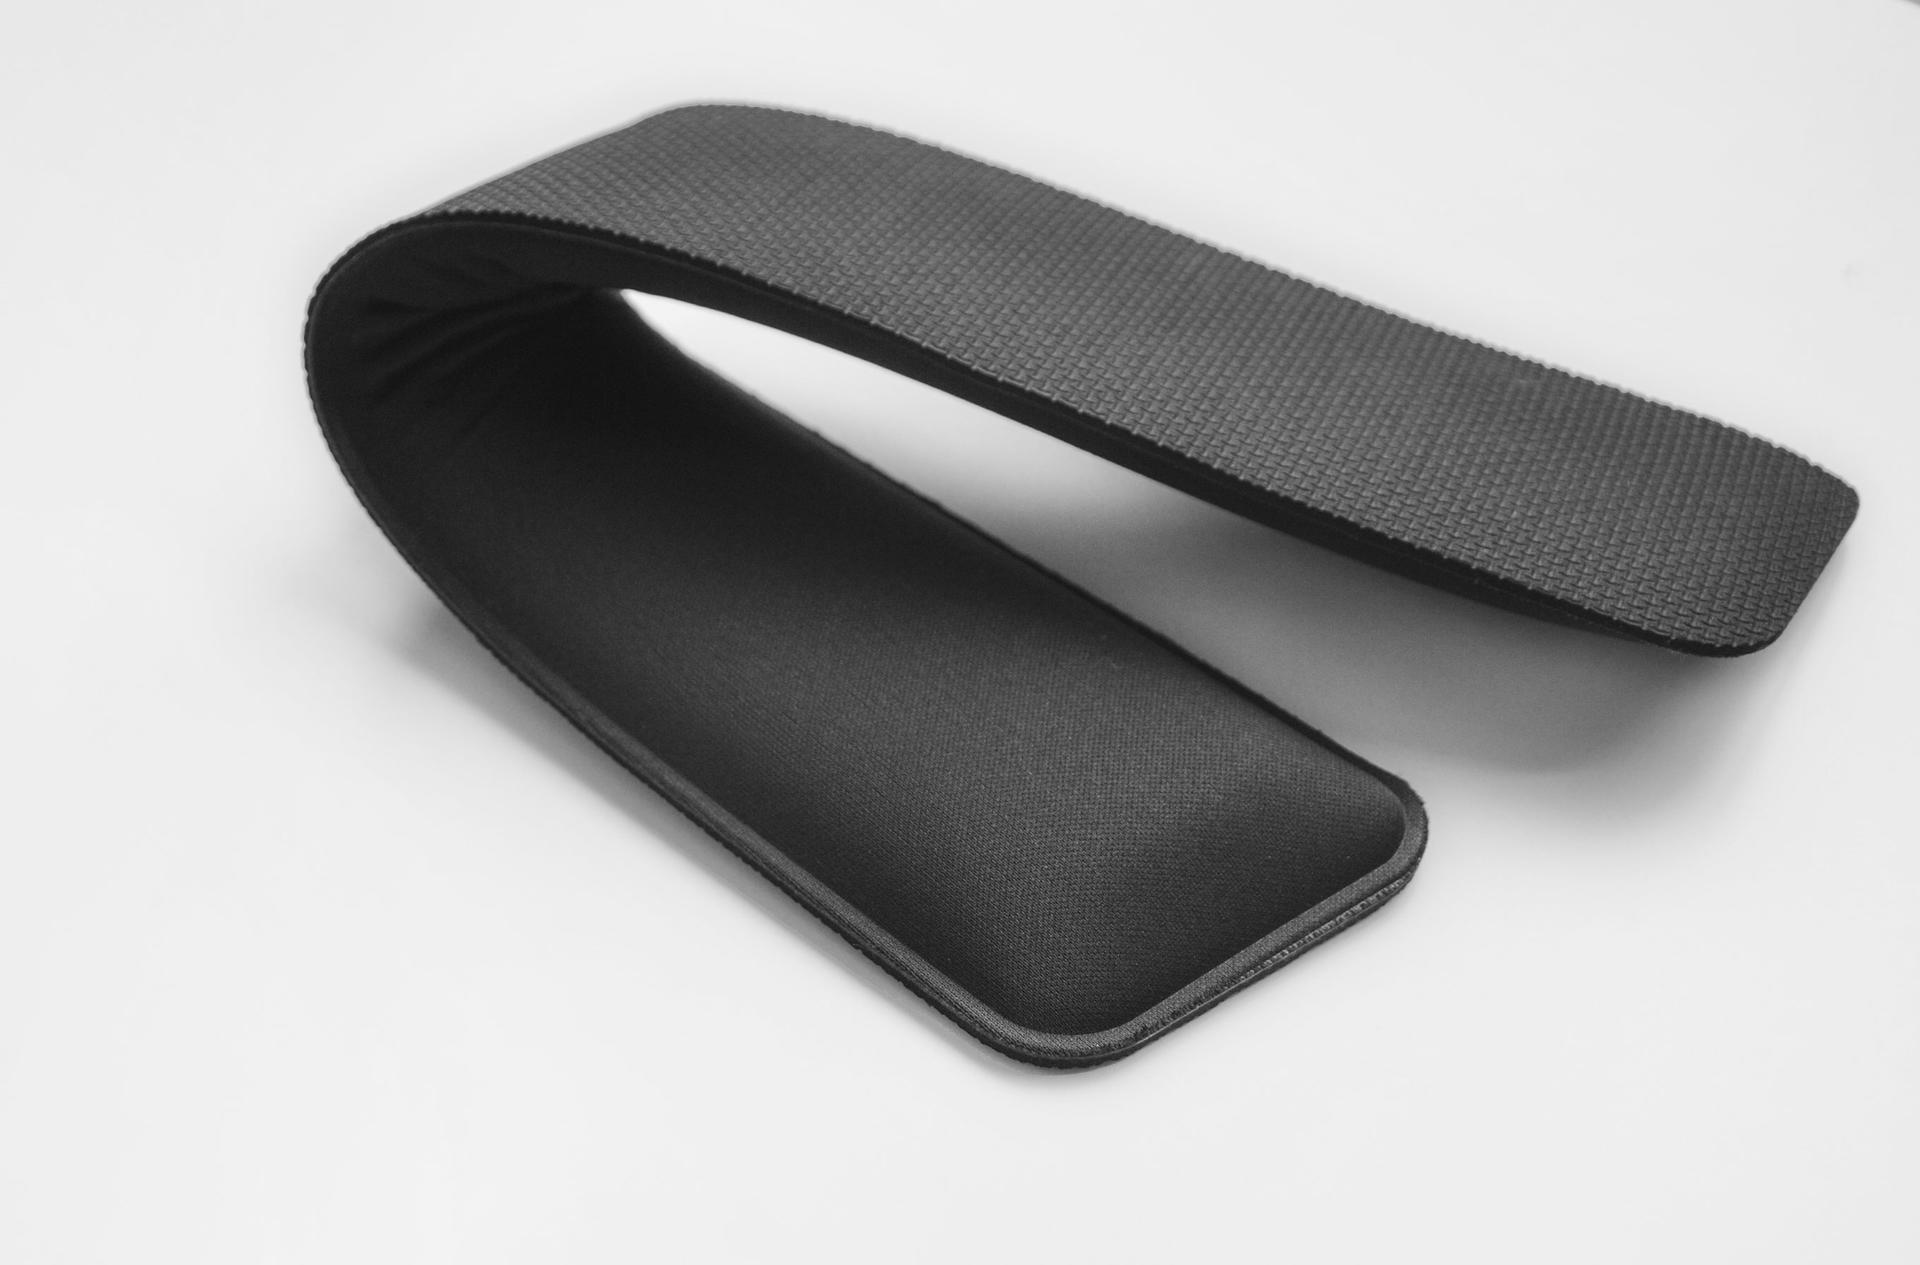 Memory foam wrist rest keyboard pad and wrist ergonomic support mouse pad set